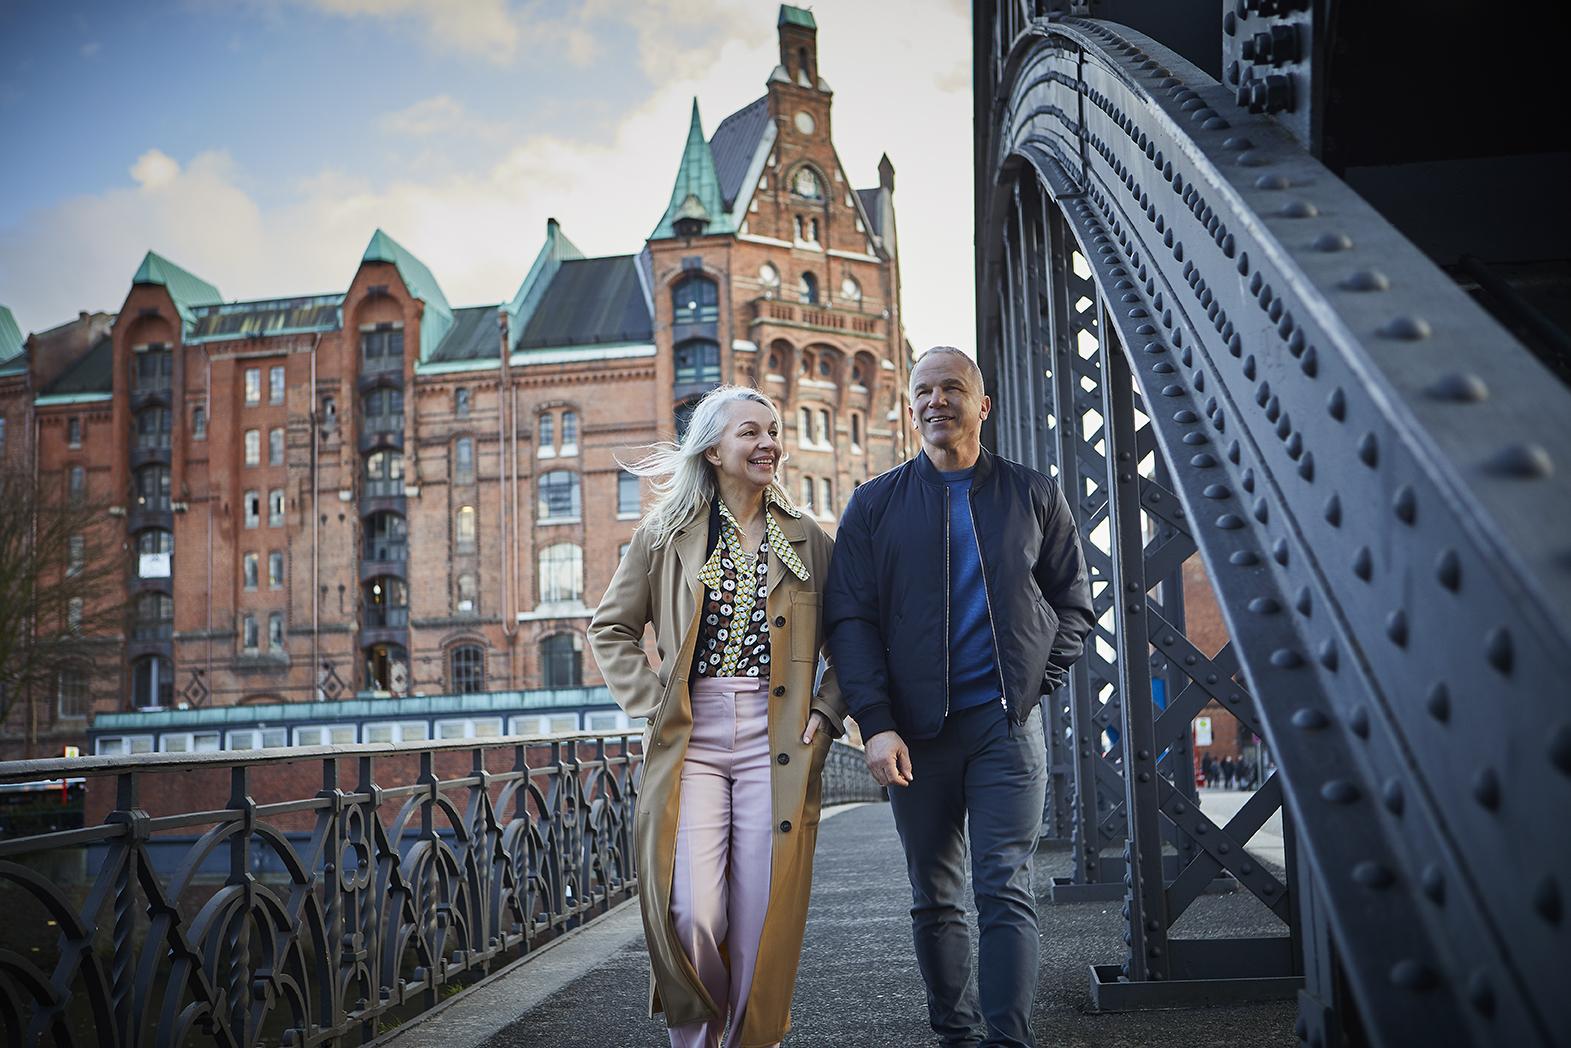 Lin and Patrick on a Hamburg bridge.